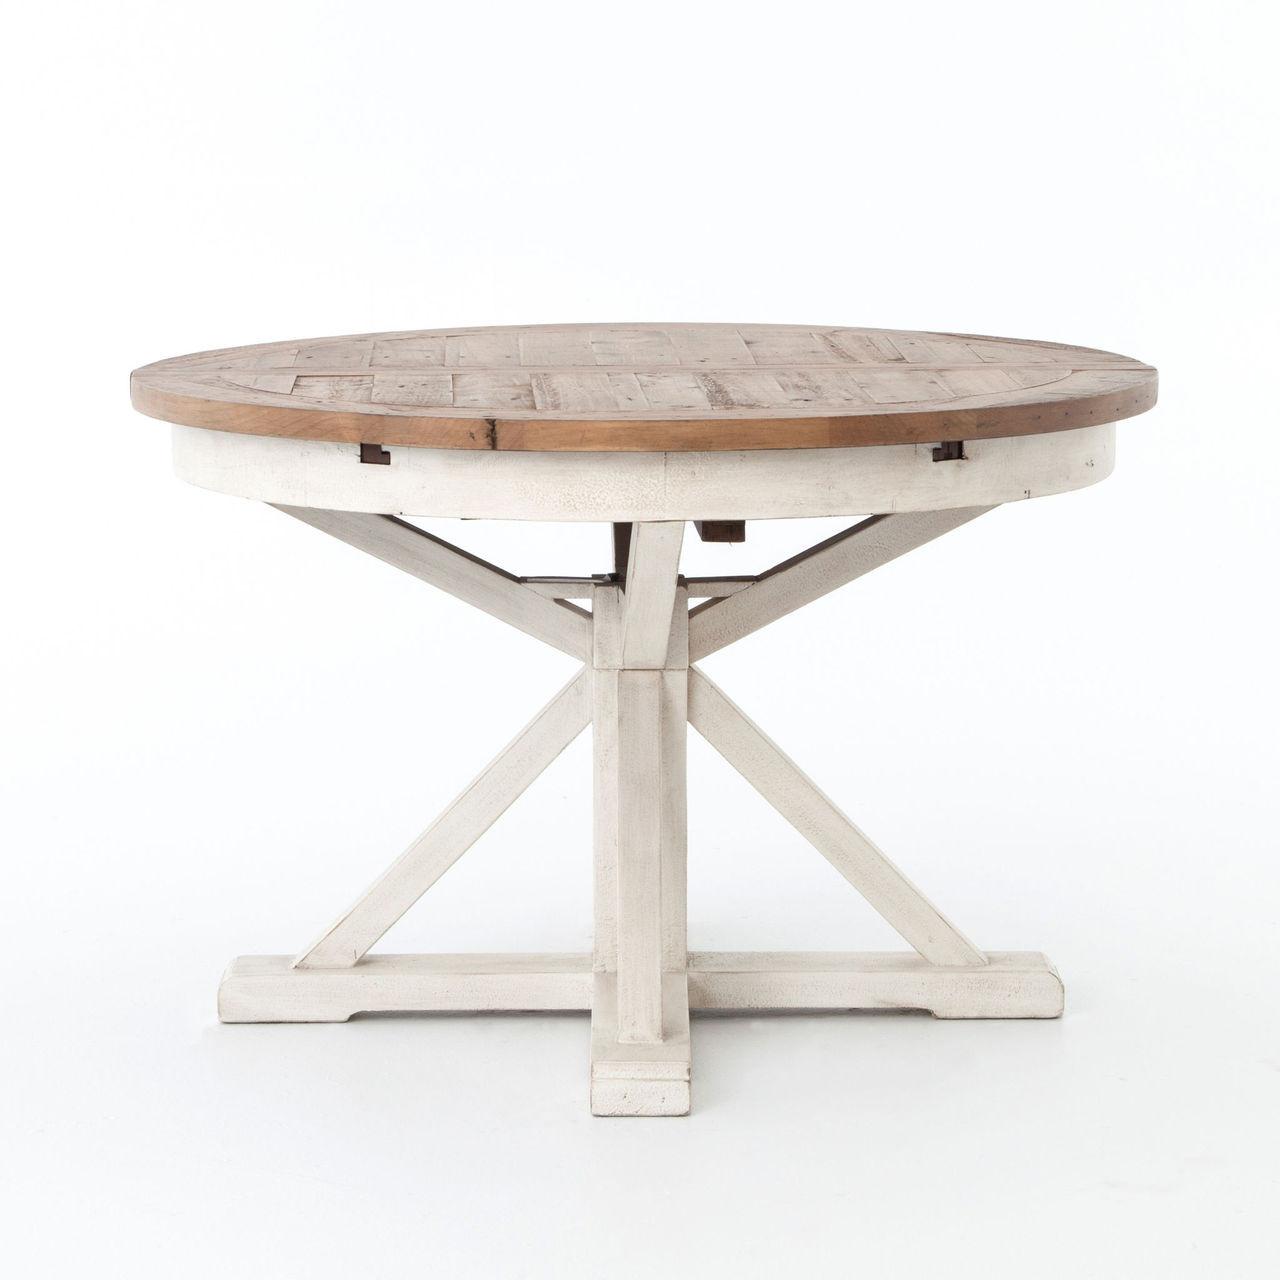 Expanding butterfly dining table   Ontwerp tafel, Eettafel ...